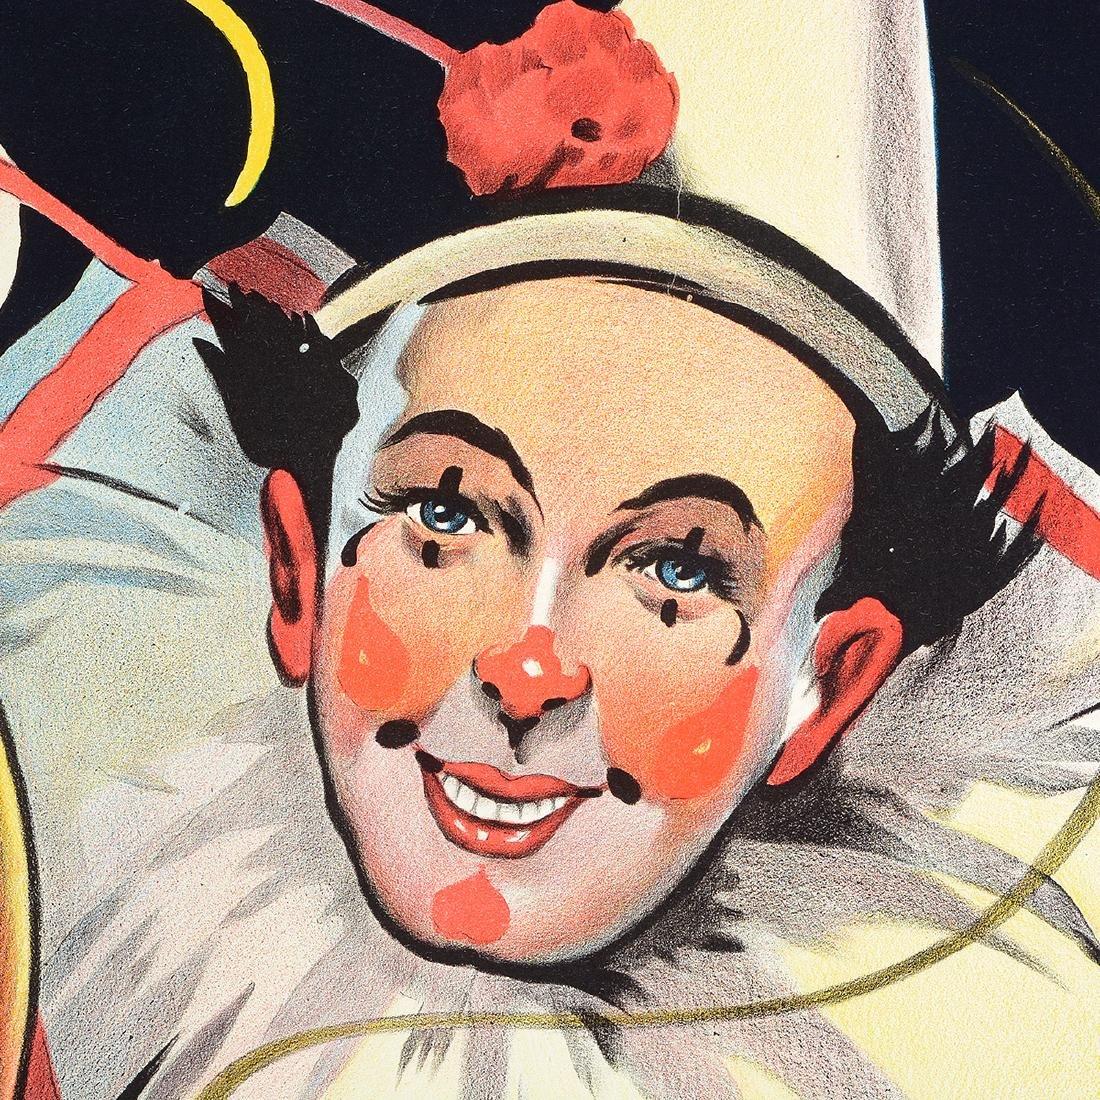 European lithograph posters Circus Stock & Cig. Leo - 3